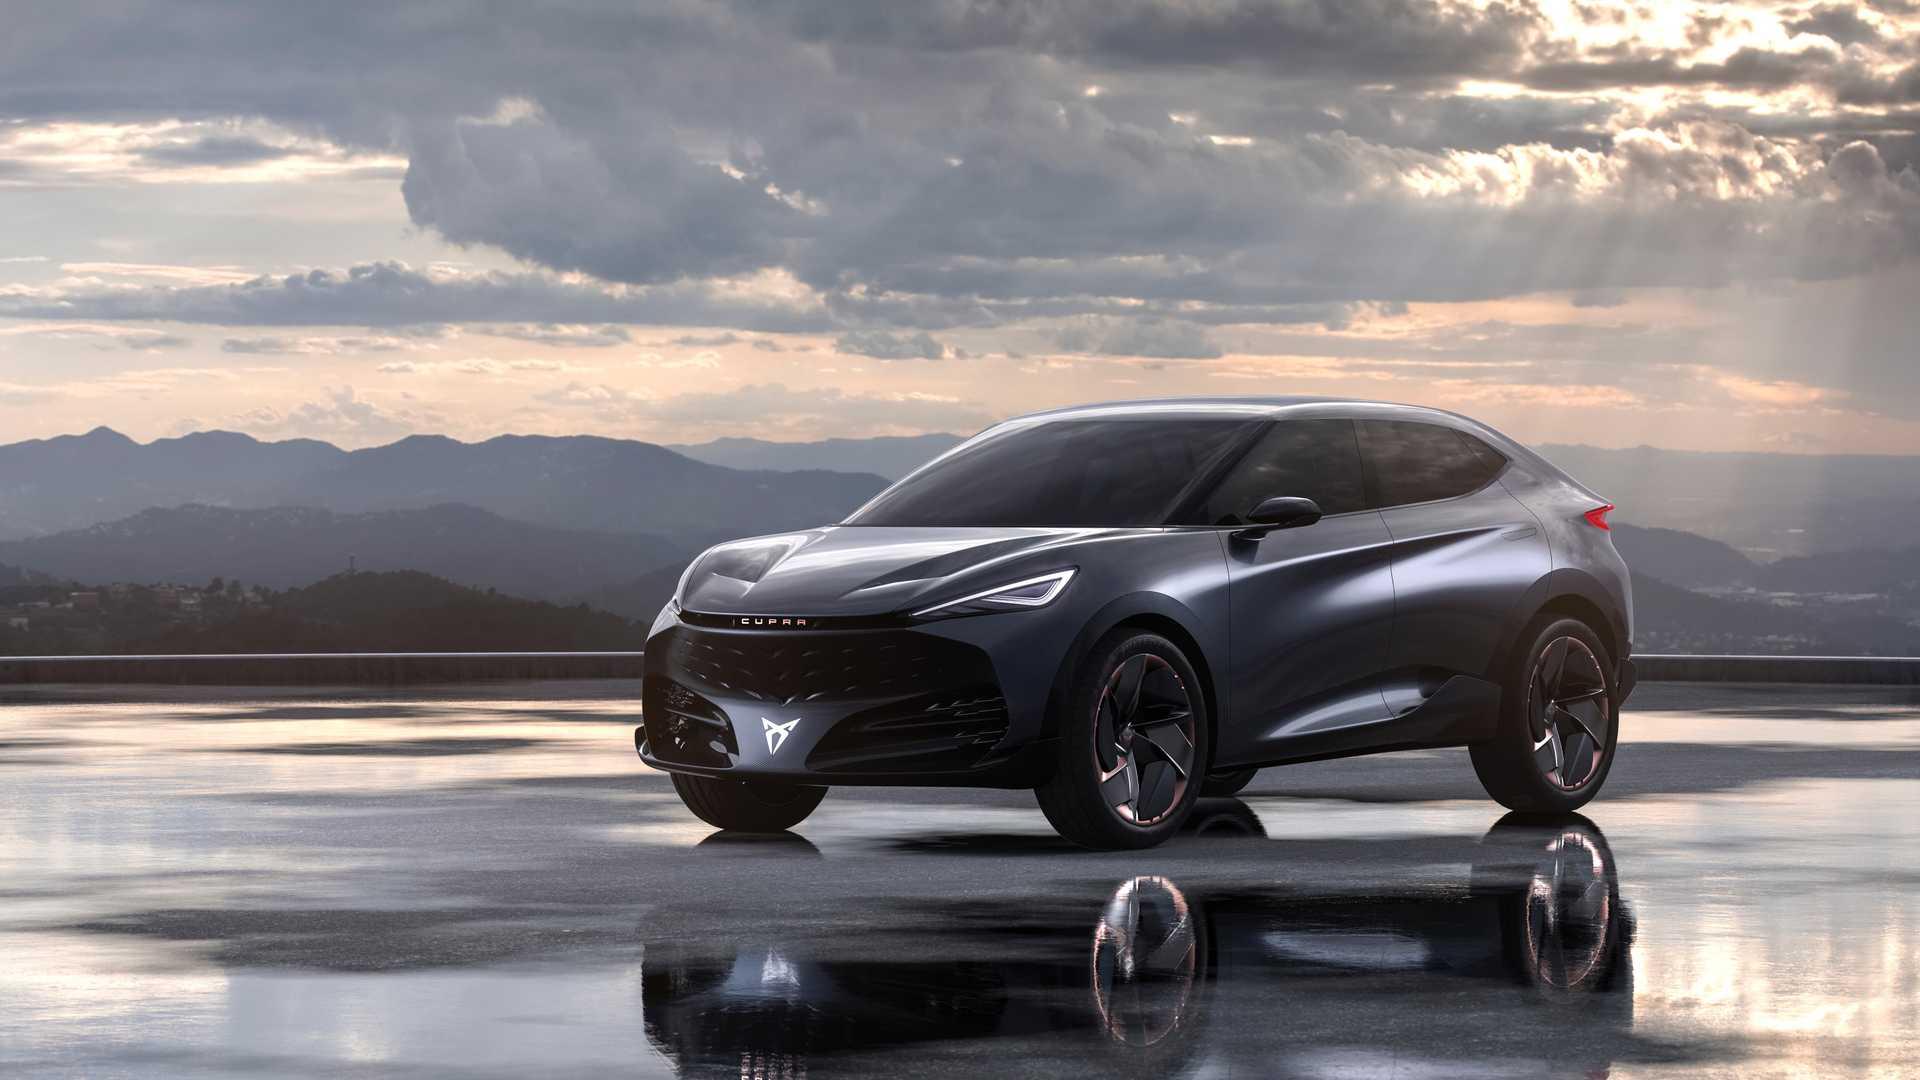 Cupra Tavascan Concept概念车官图发布 法兰克福车展亮相